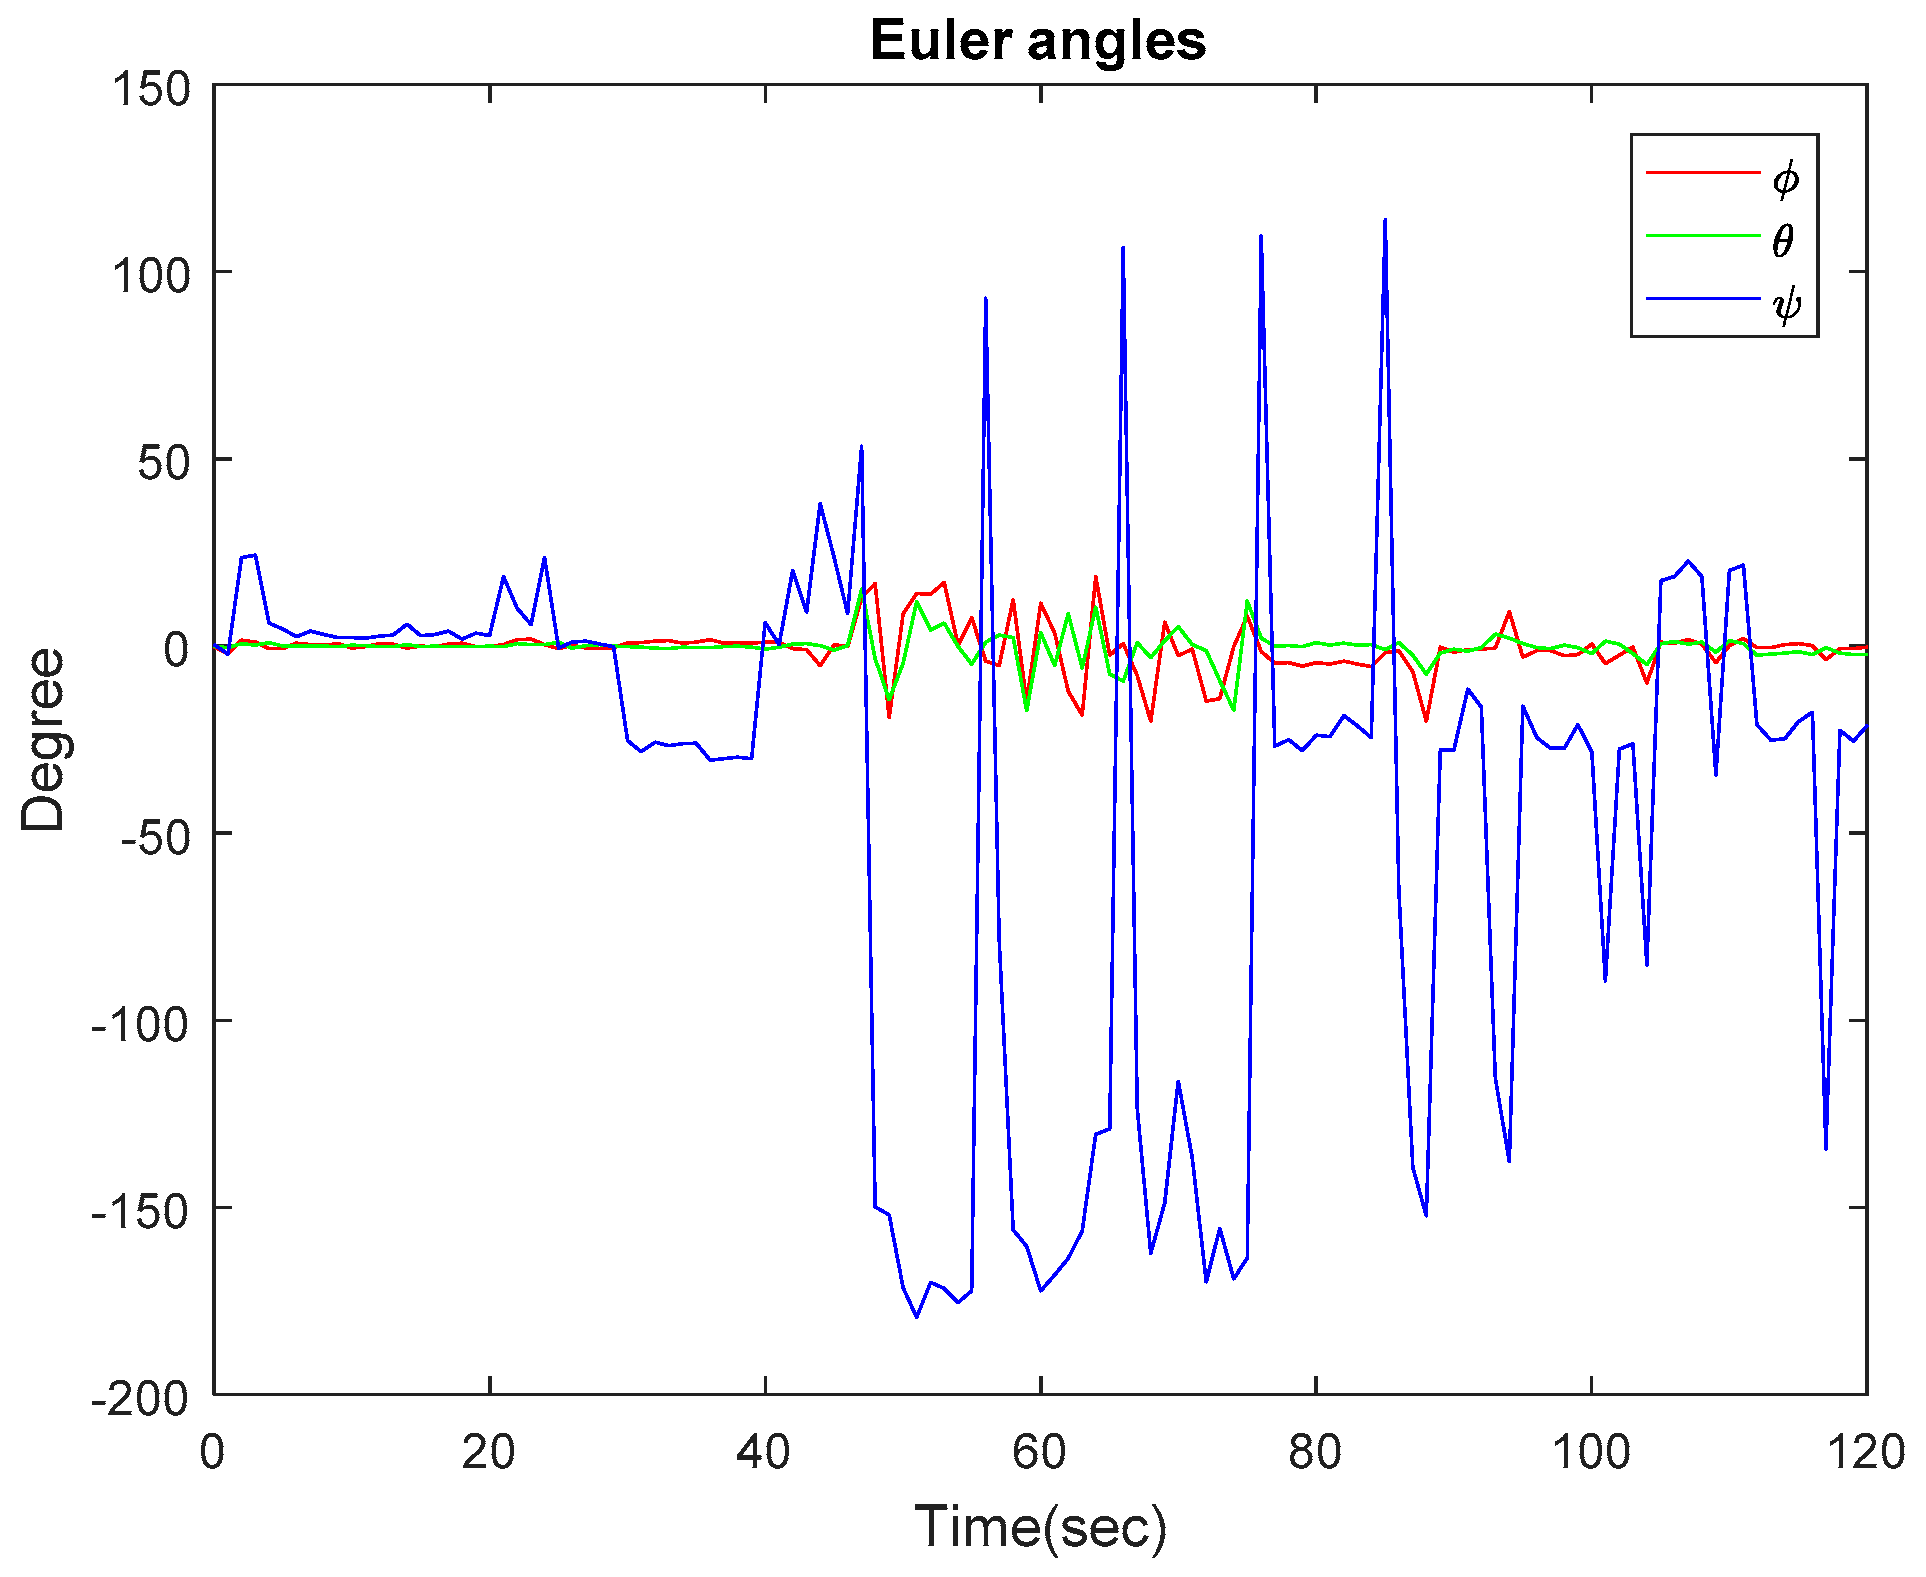 hight resolution of minn kota maxxum 101 with built in sonar wiring diagram minn kota maxxum 70 minn kota maxxum 70